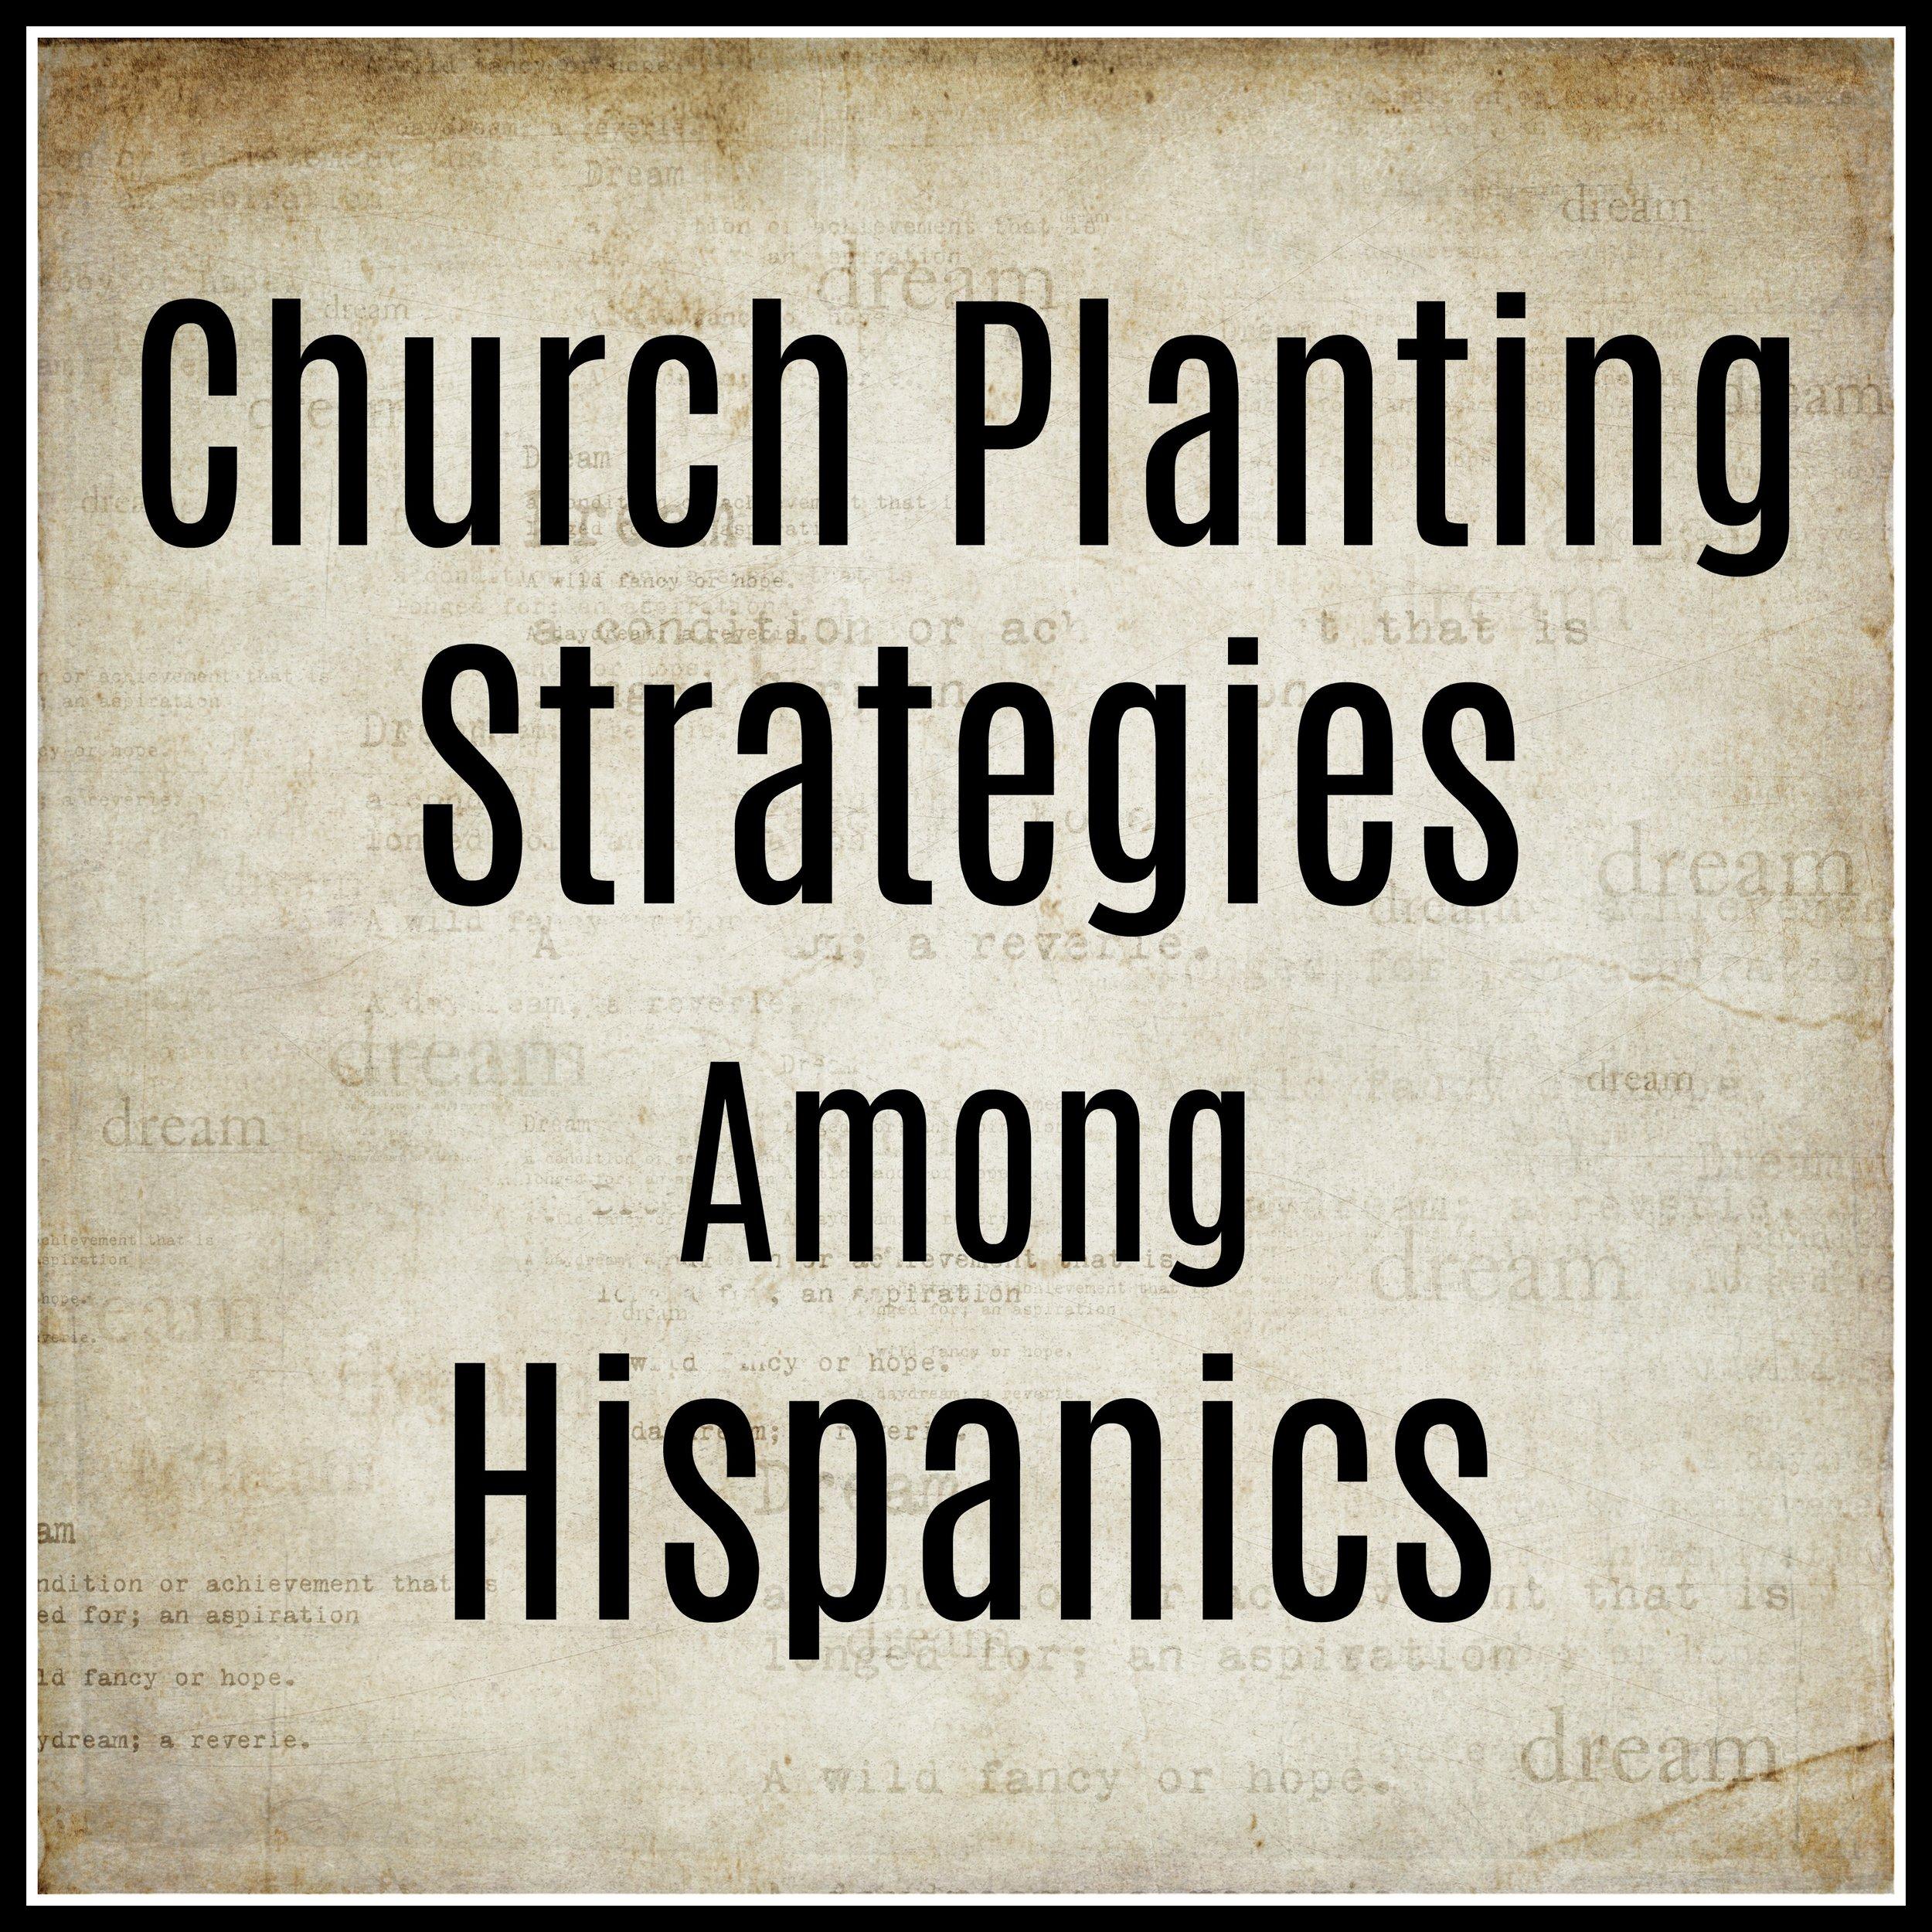 Church Planting Strategies Among Hispanics.jpg